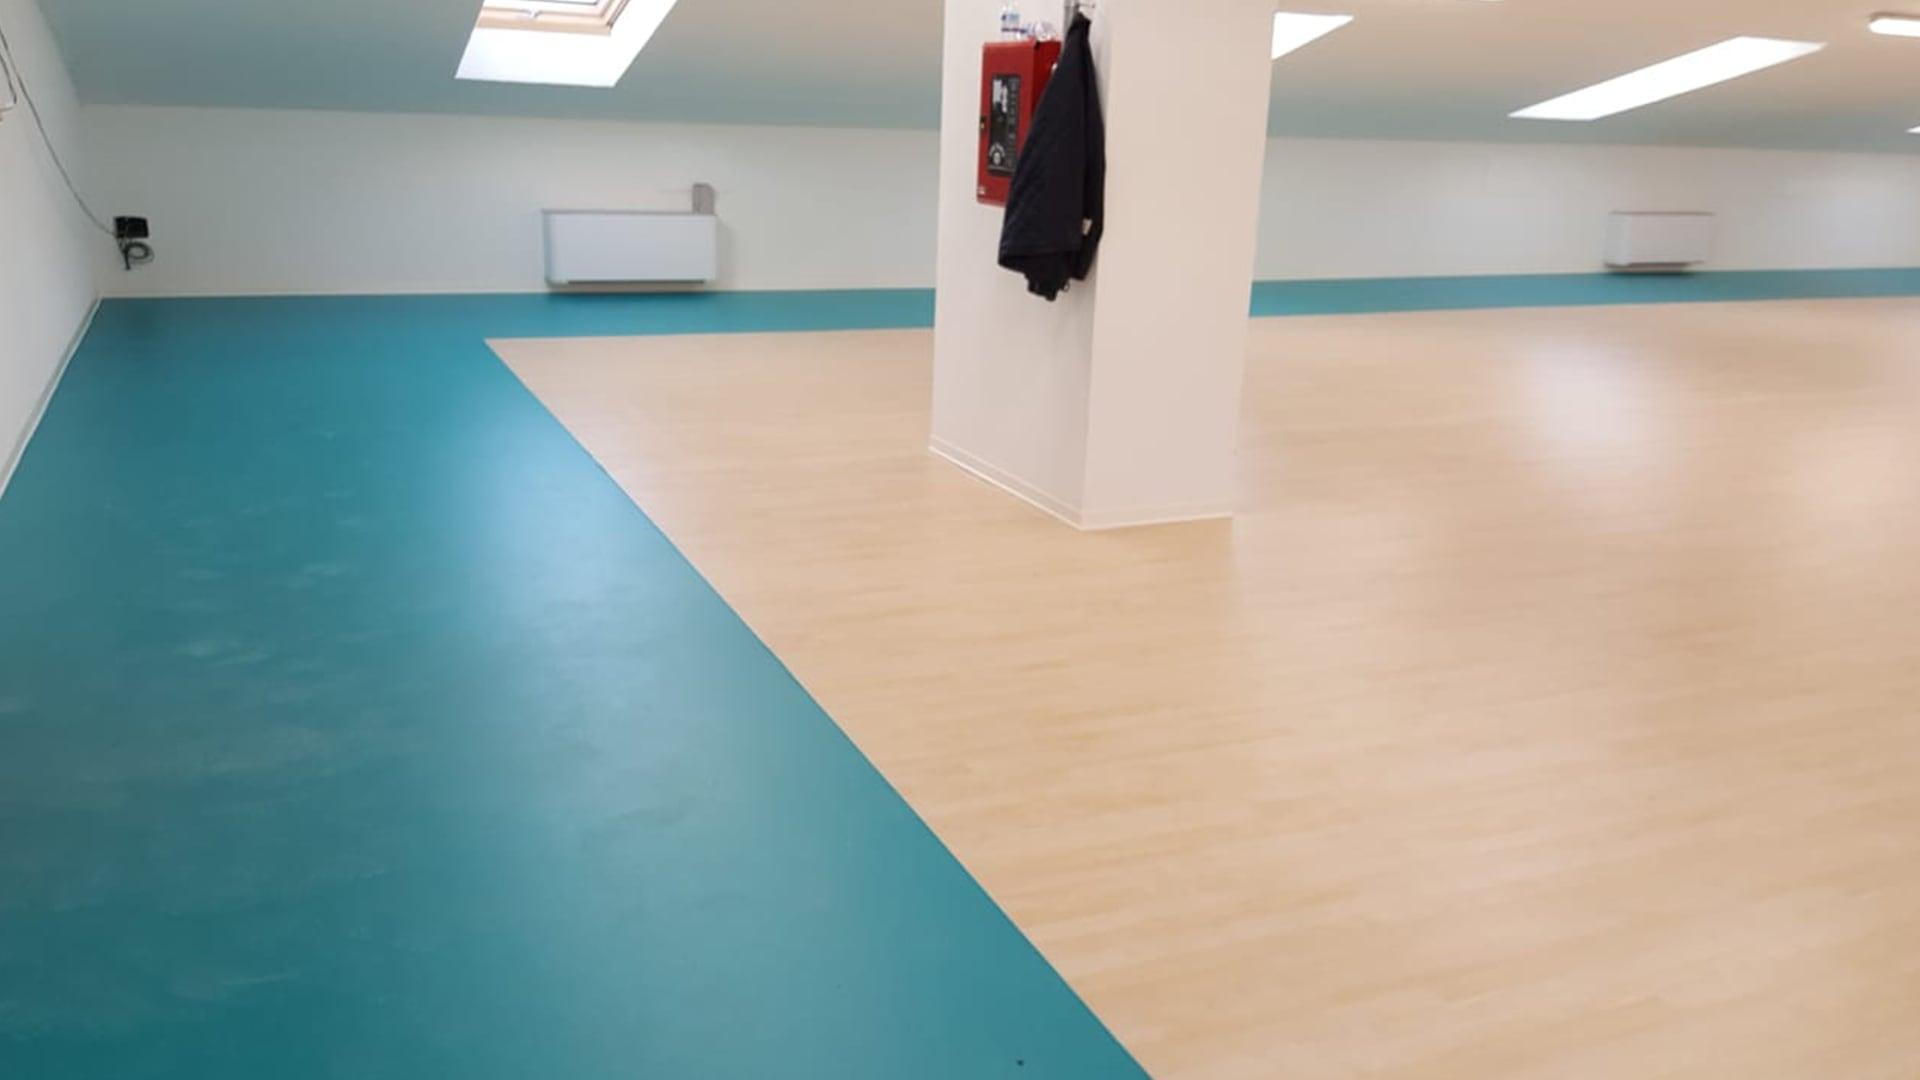 pavimento-sportivo-palestra-tarkett_2